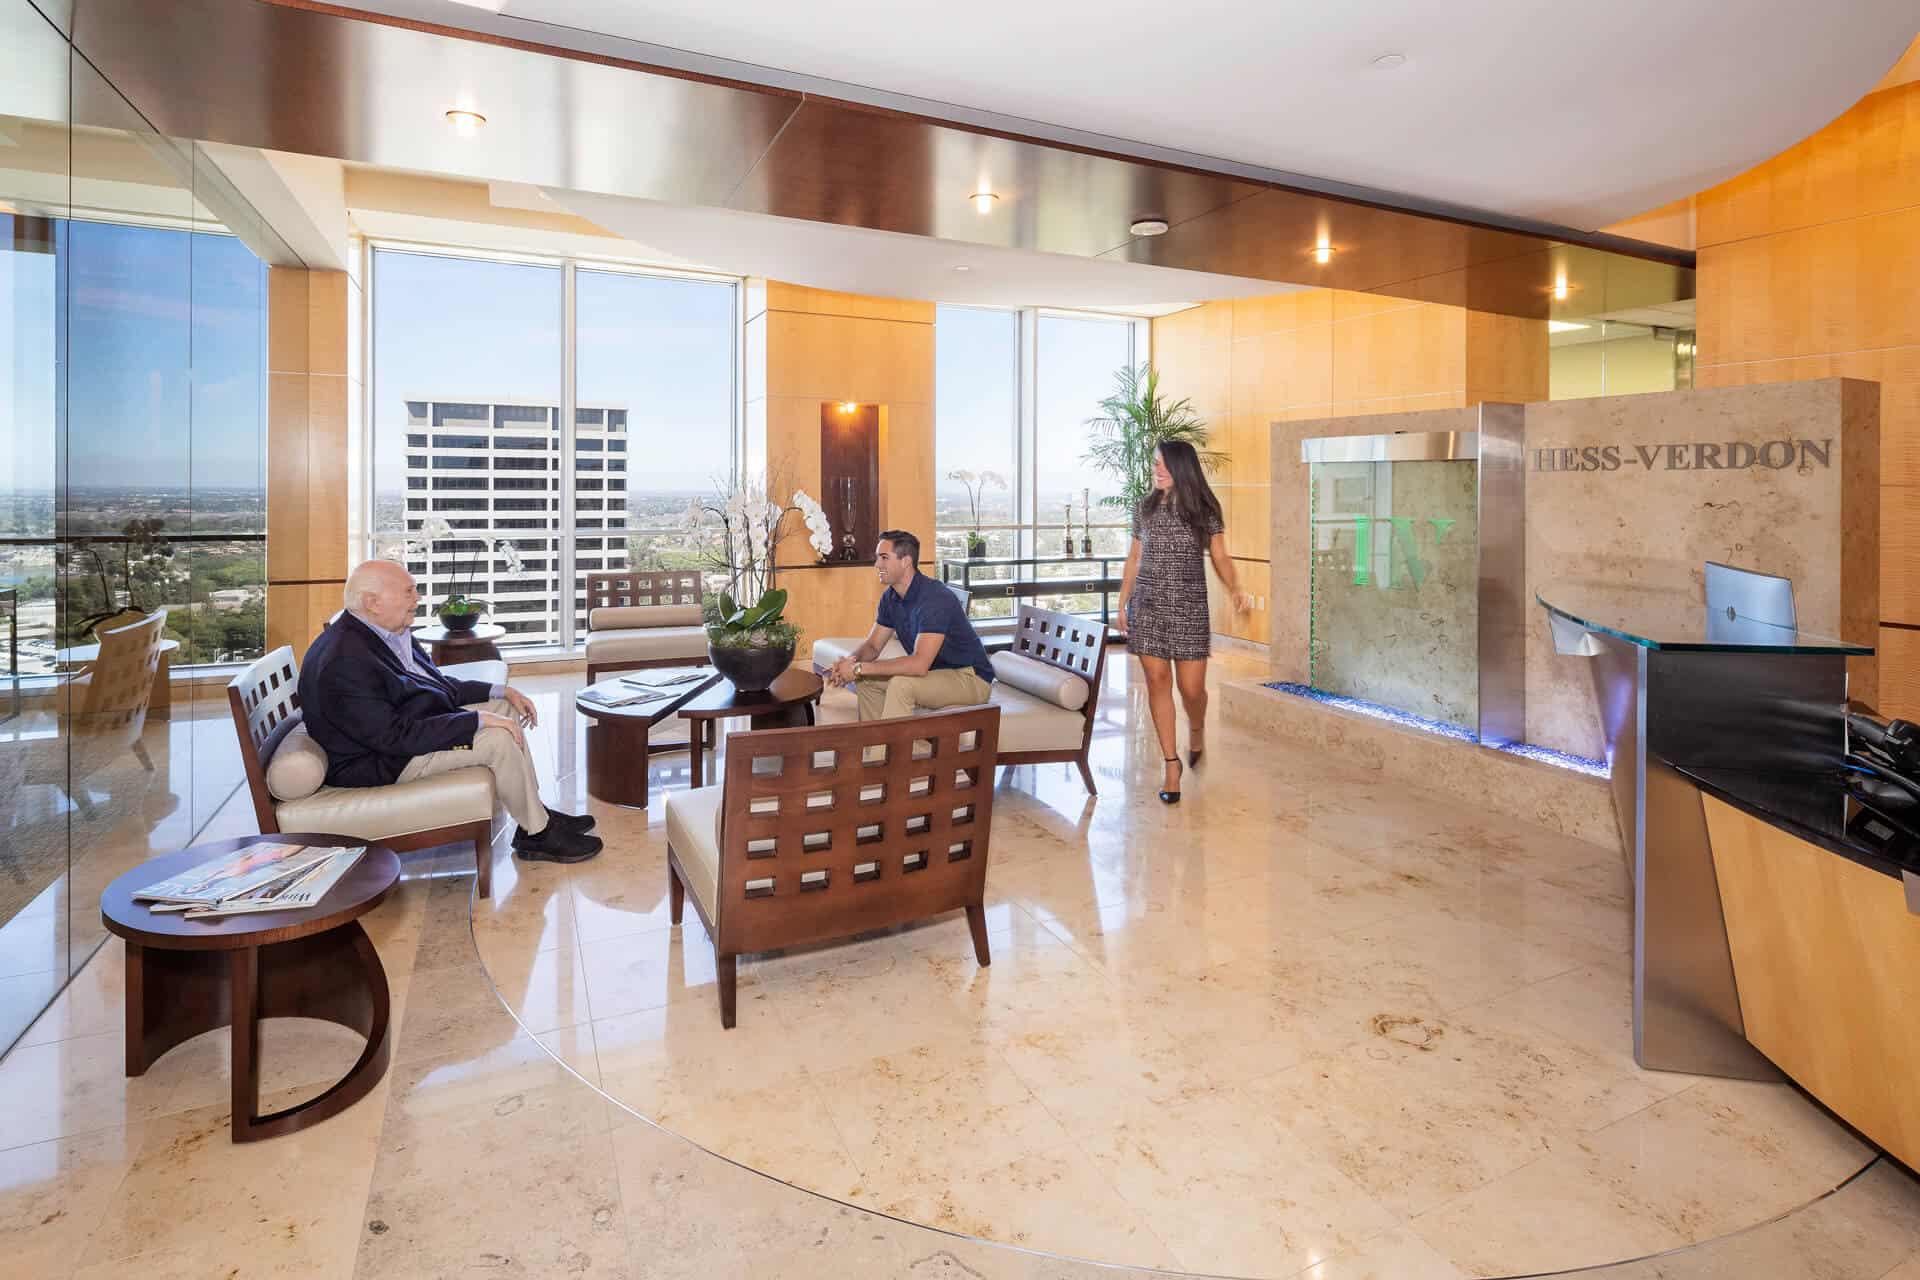 Hess-Verdon & Associates PLC